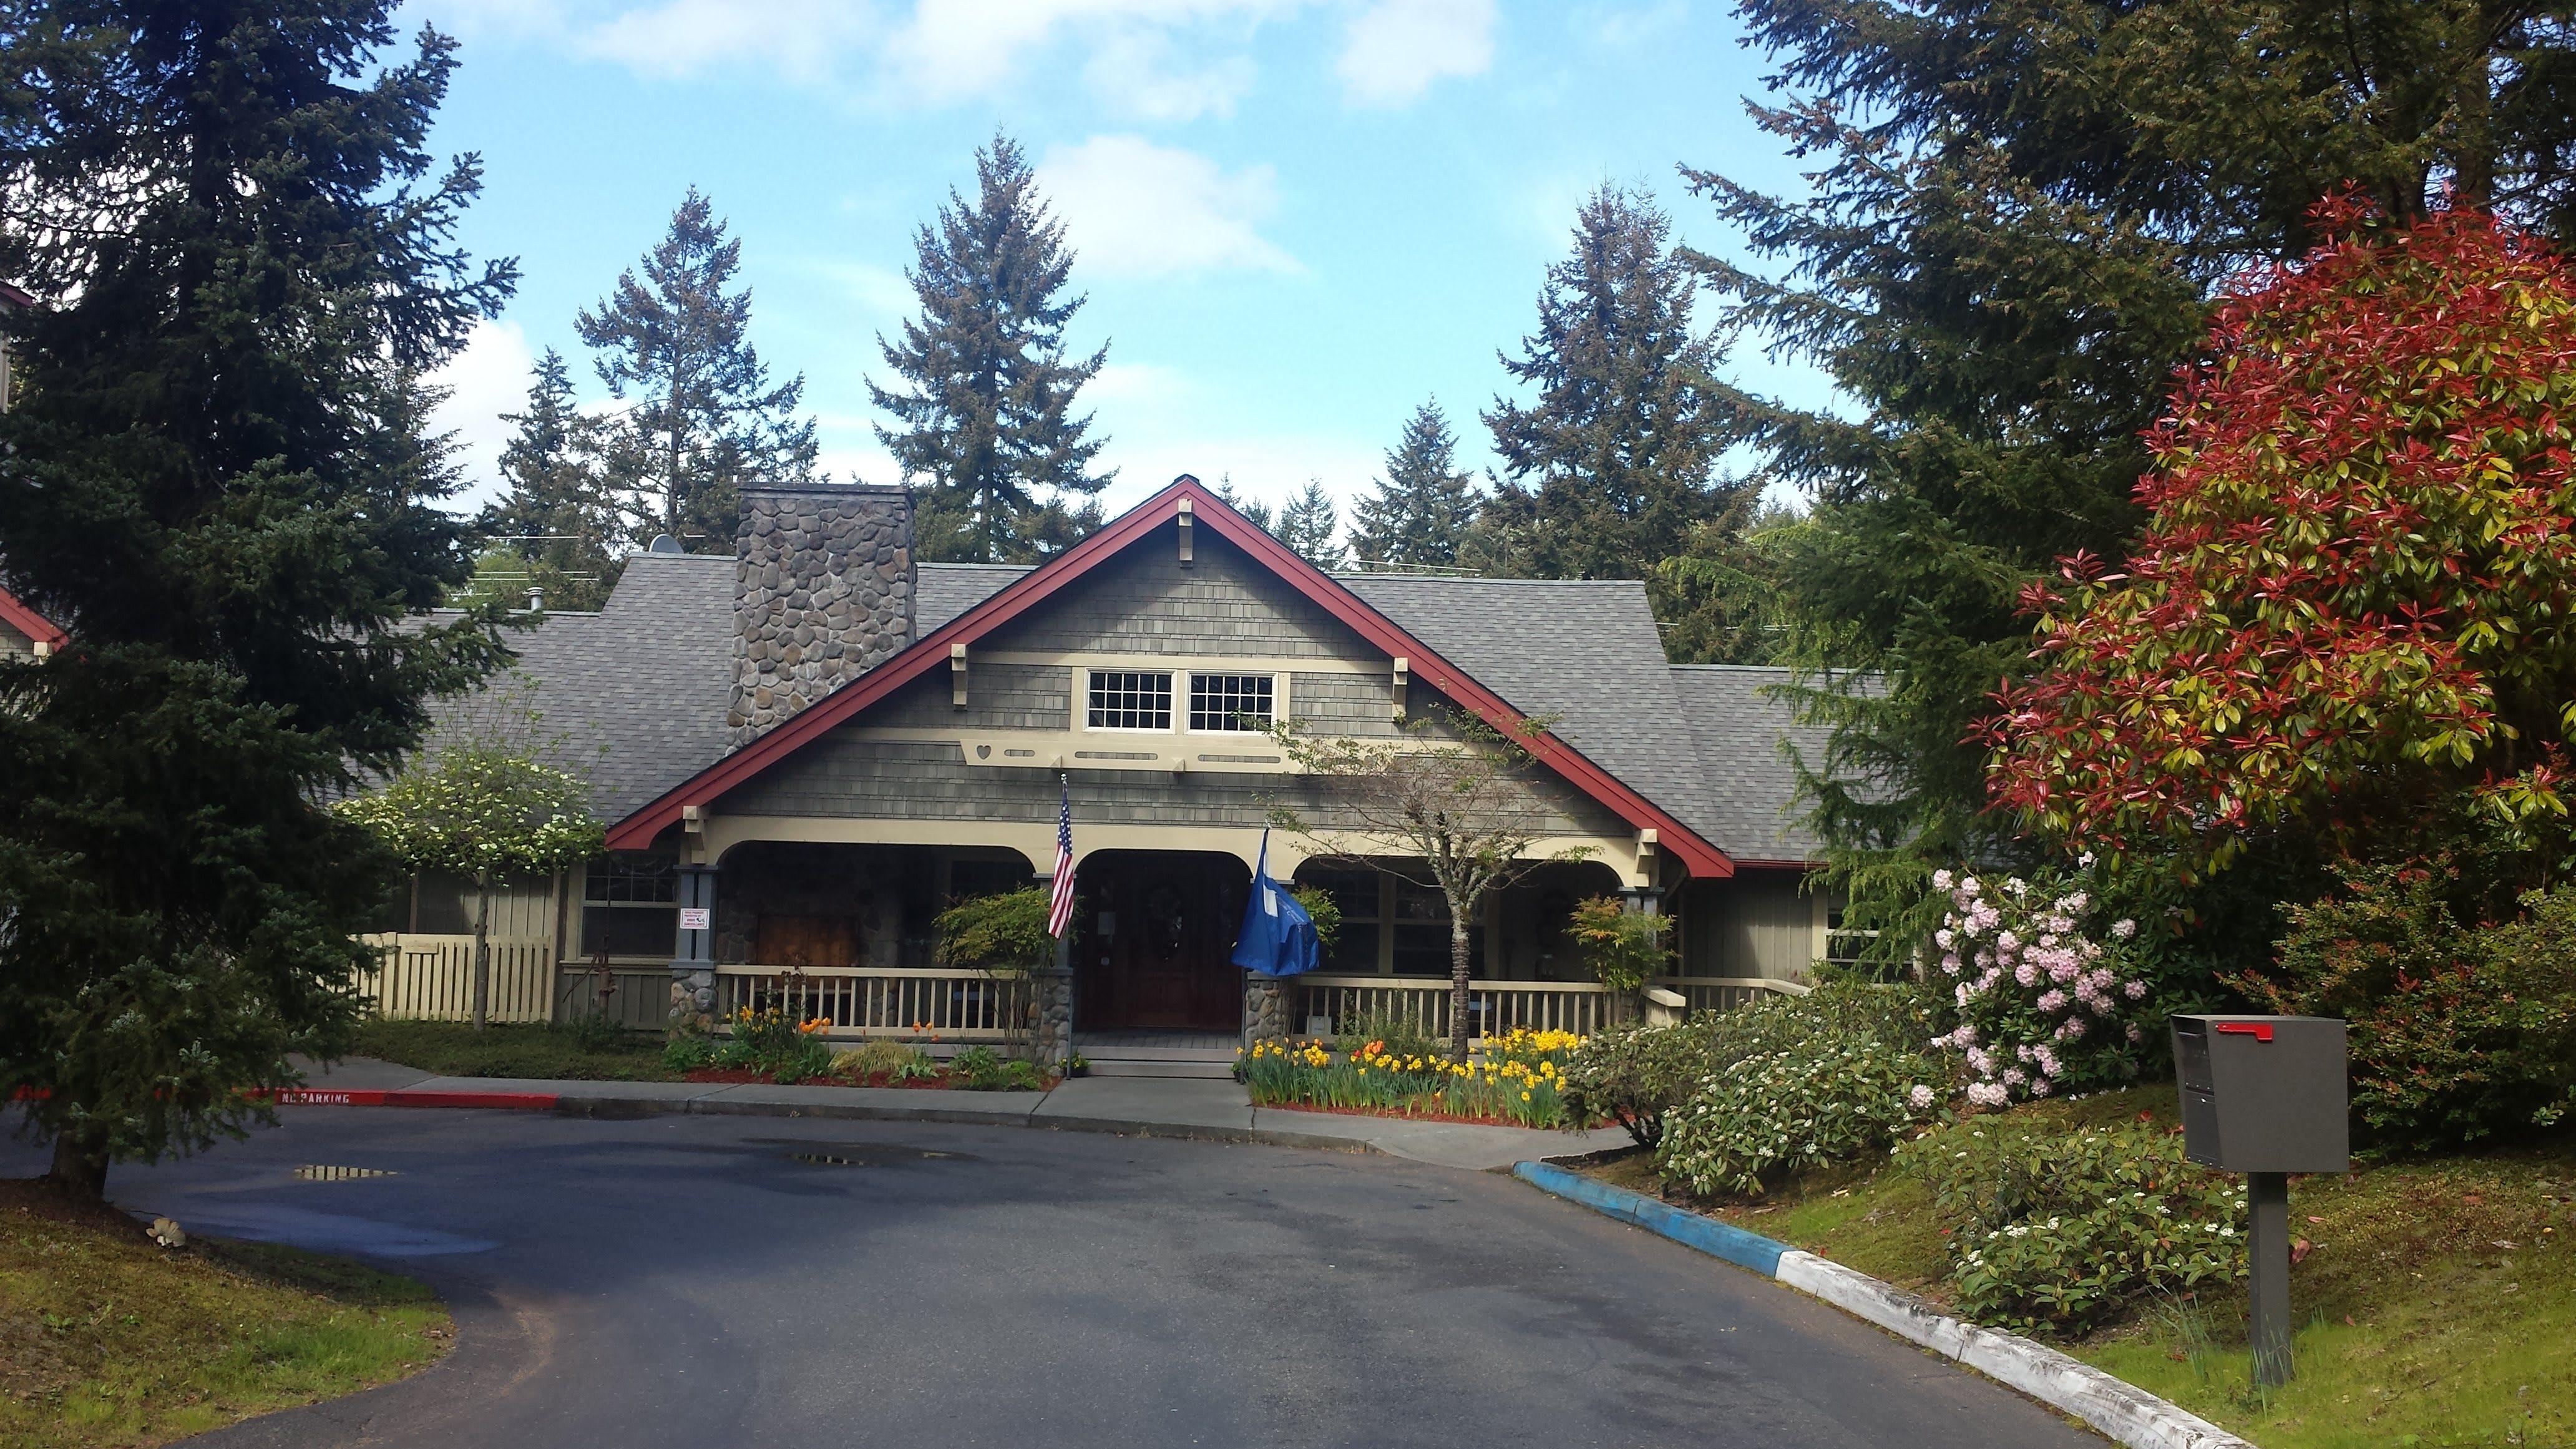 Photo 1 of Olympic Alzheimer's Residence